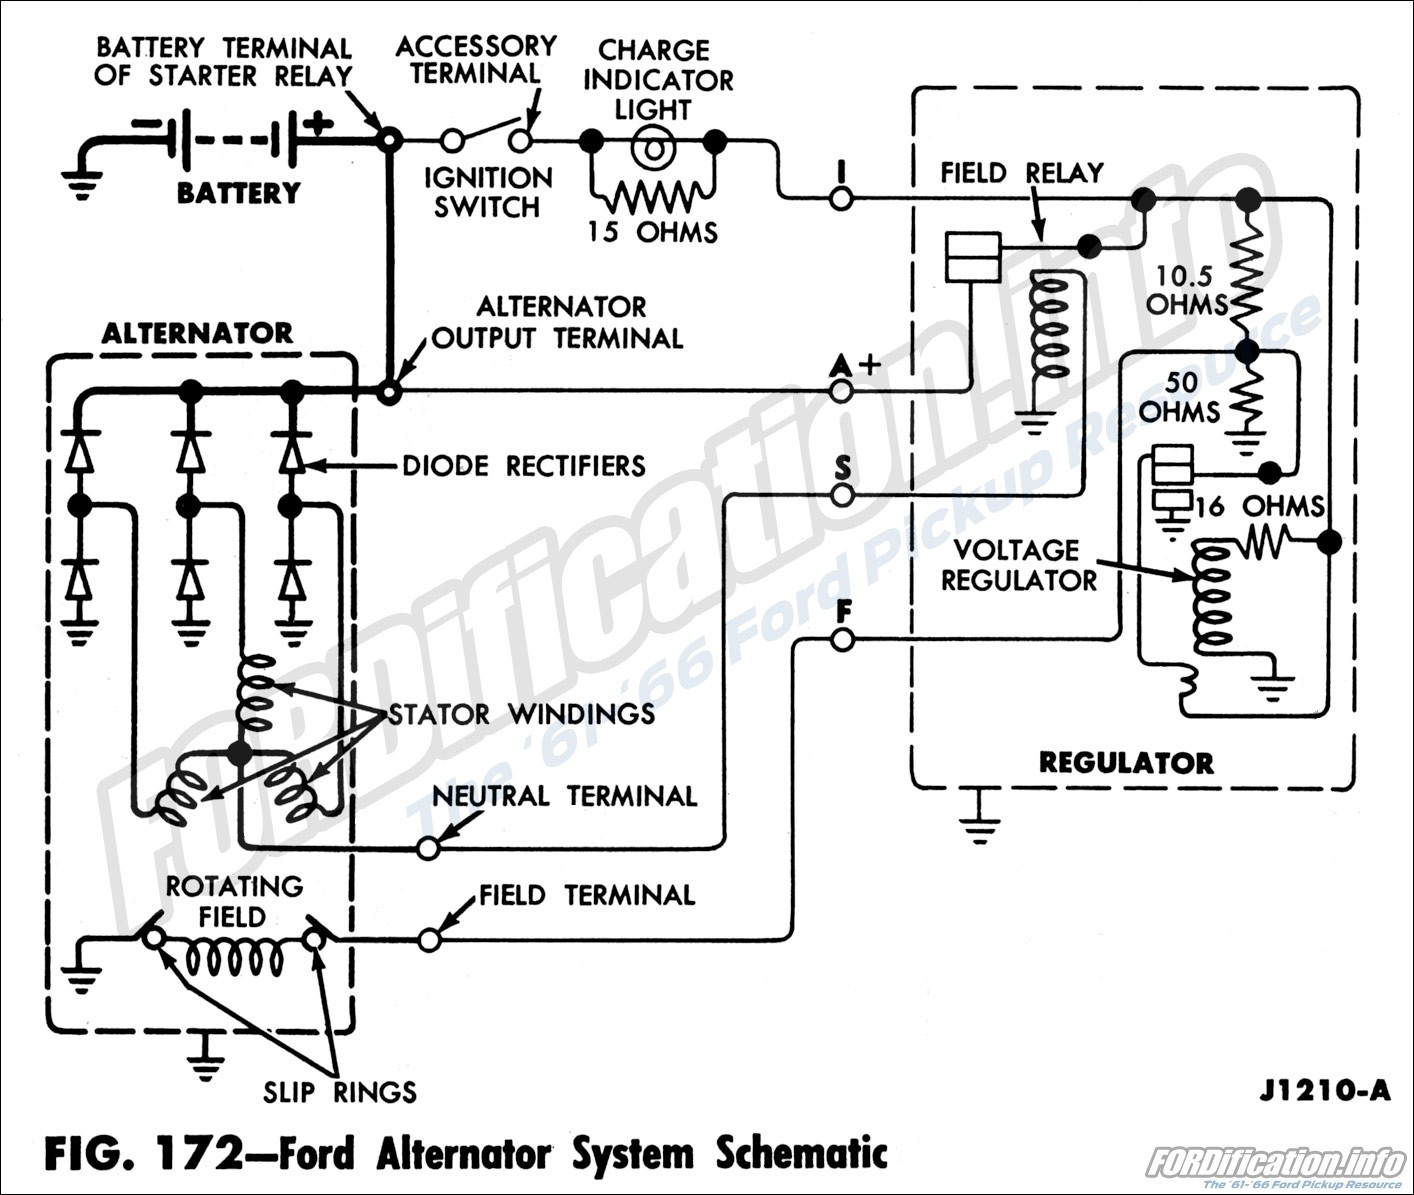 1963 Ford Alternator System Schematic